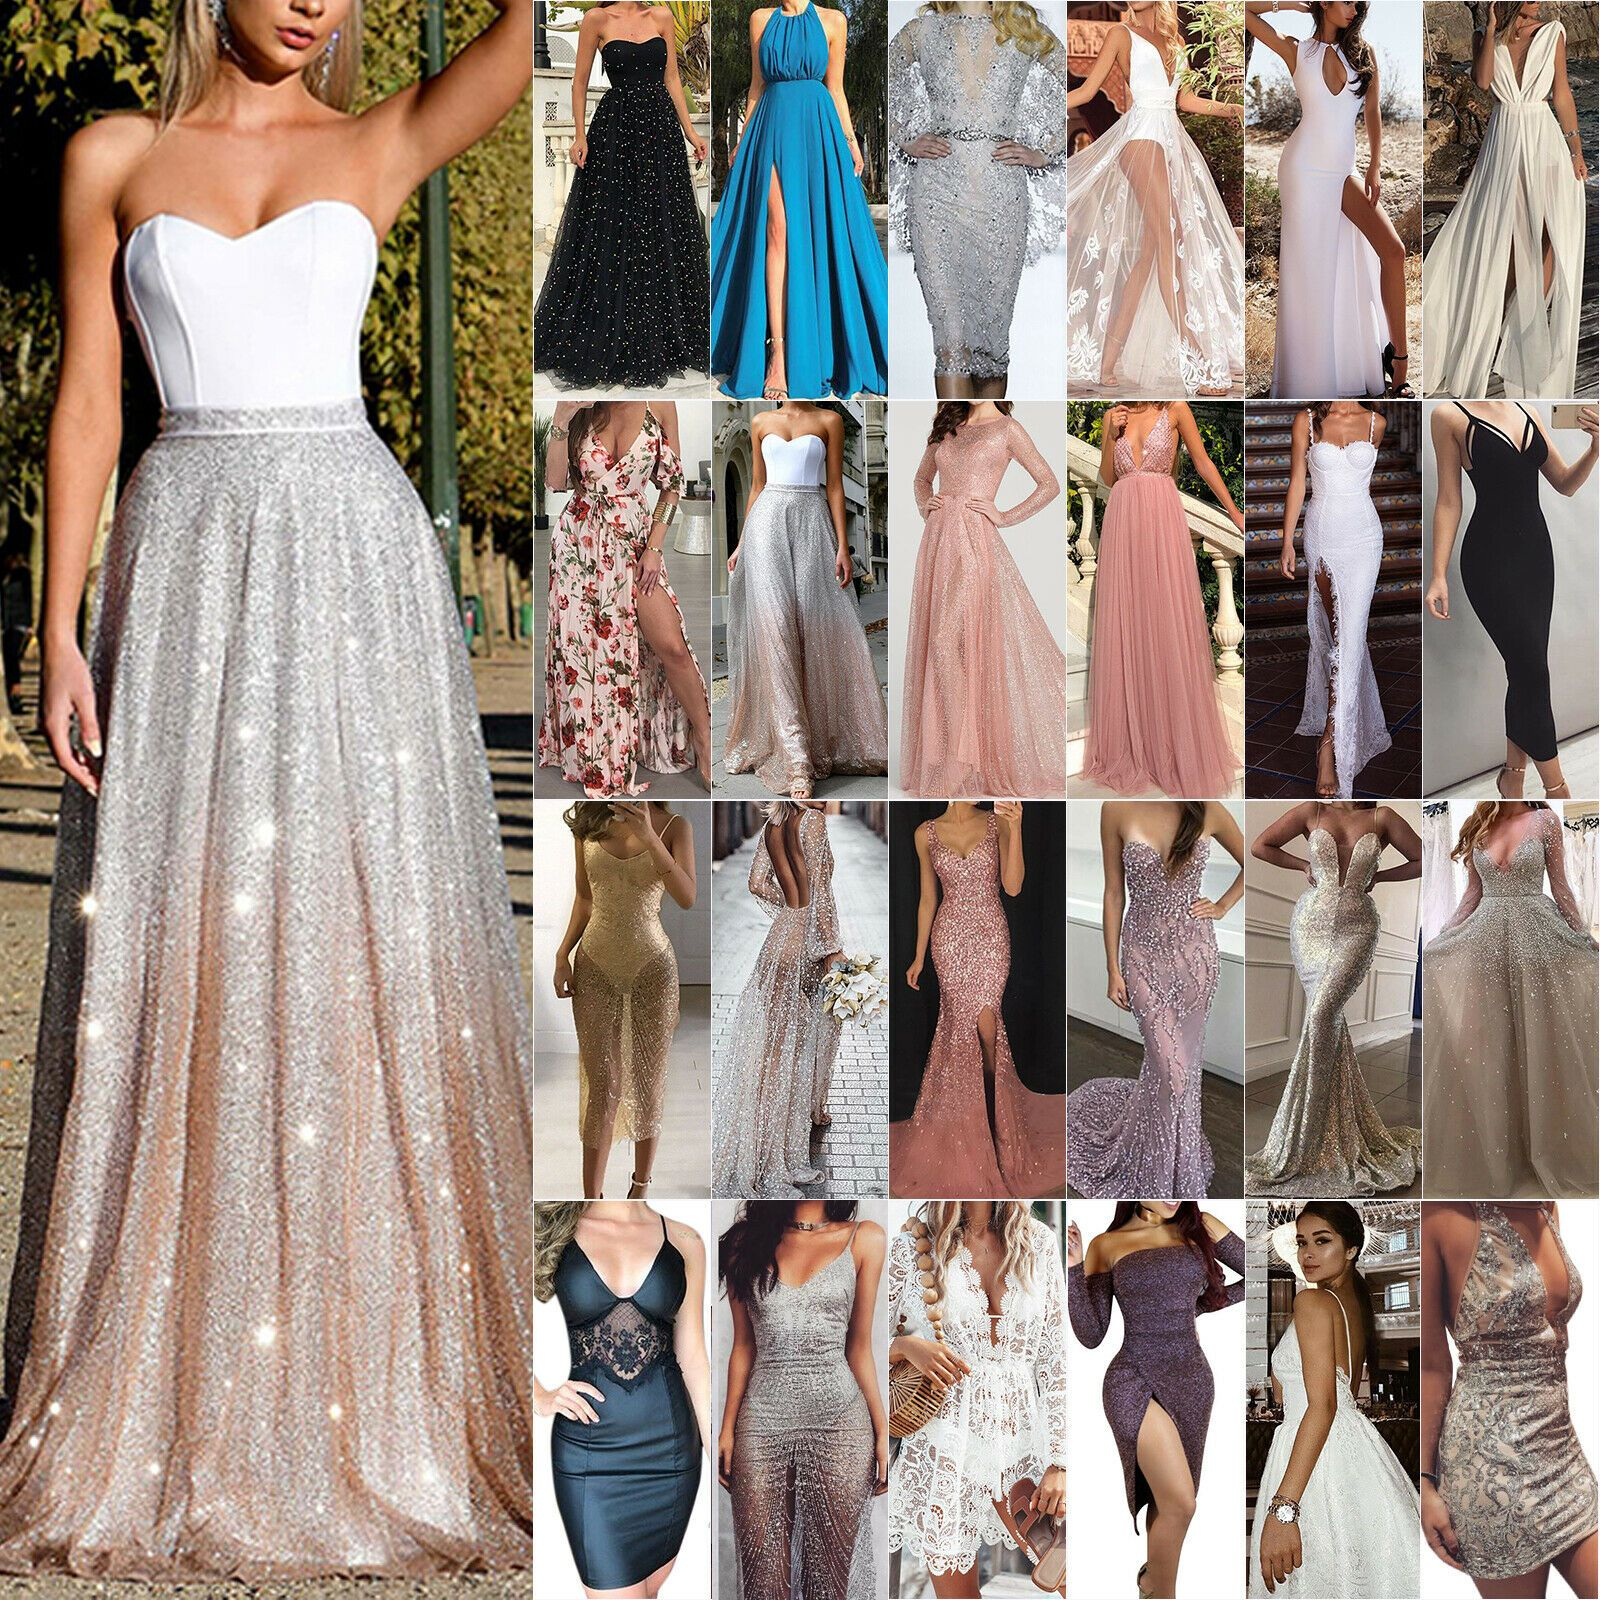 Womens Maxi Dress Evening Party SummerCocktail Prom Gown Ball Beach Sleeveless